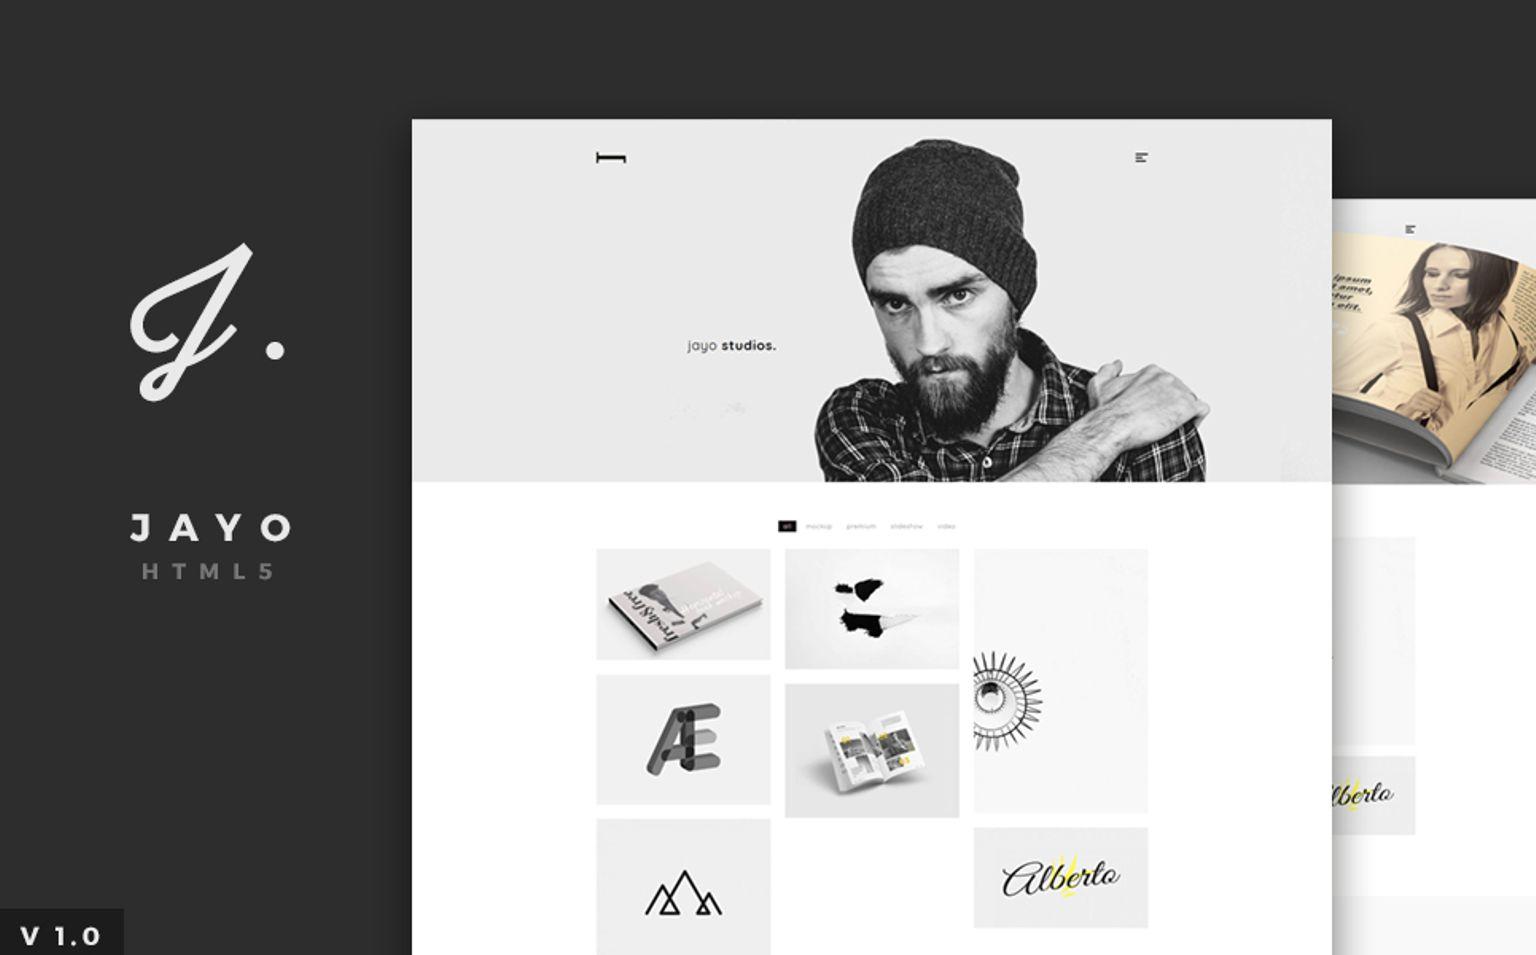 Fantastisch Galerie Website Vorlage Galerie - Entry Level Resume ...